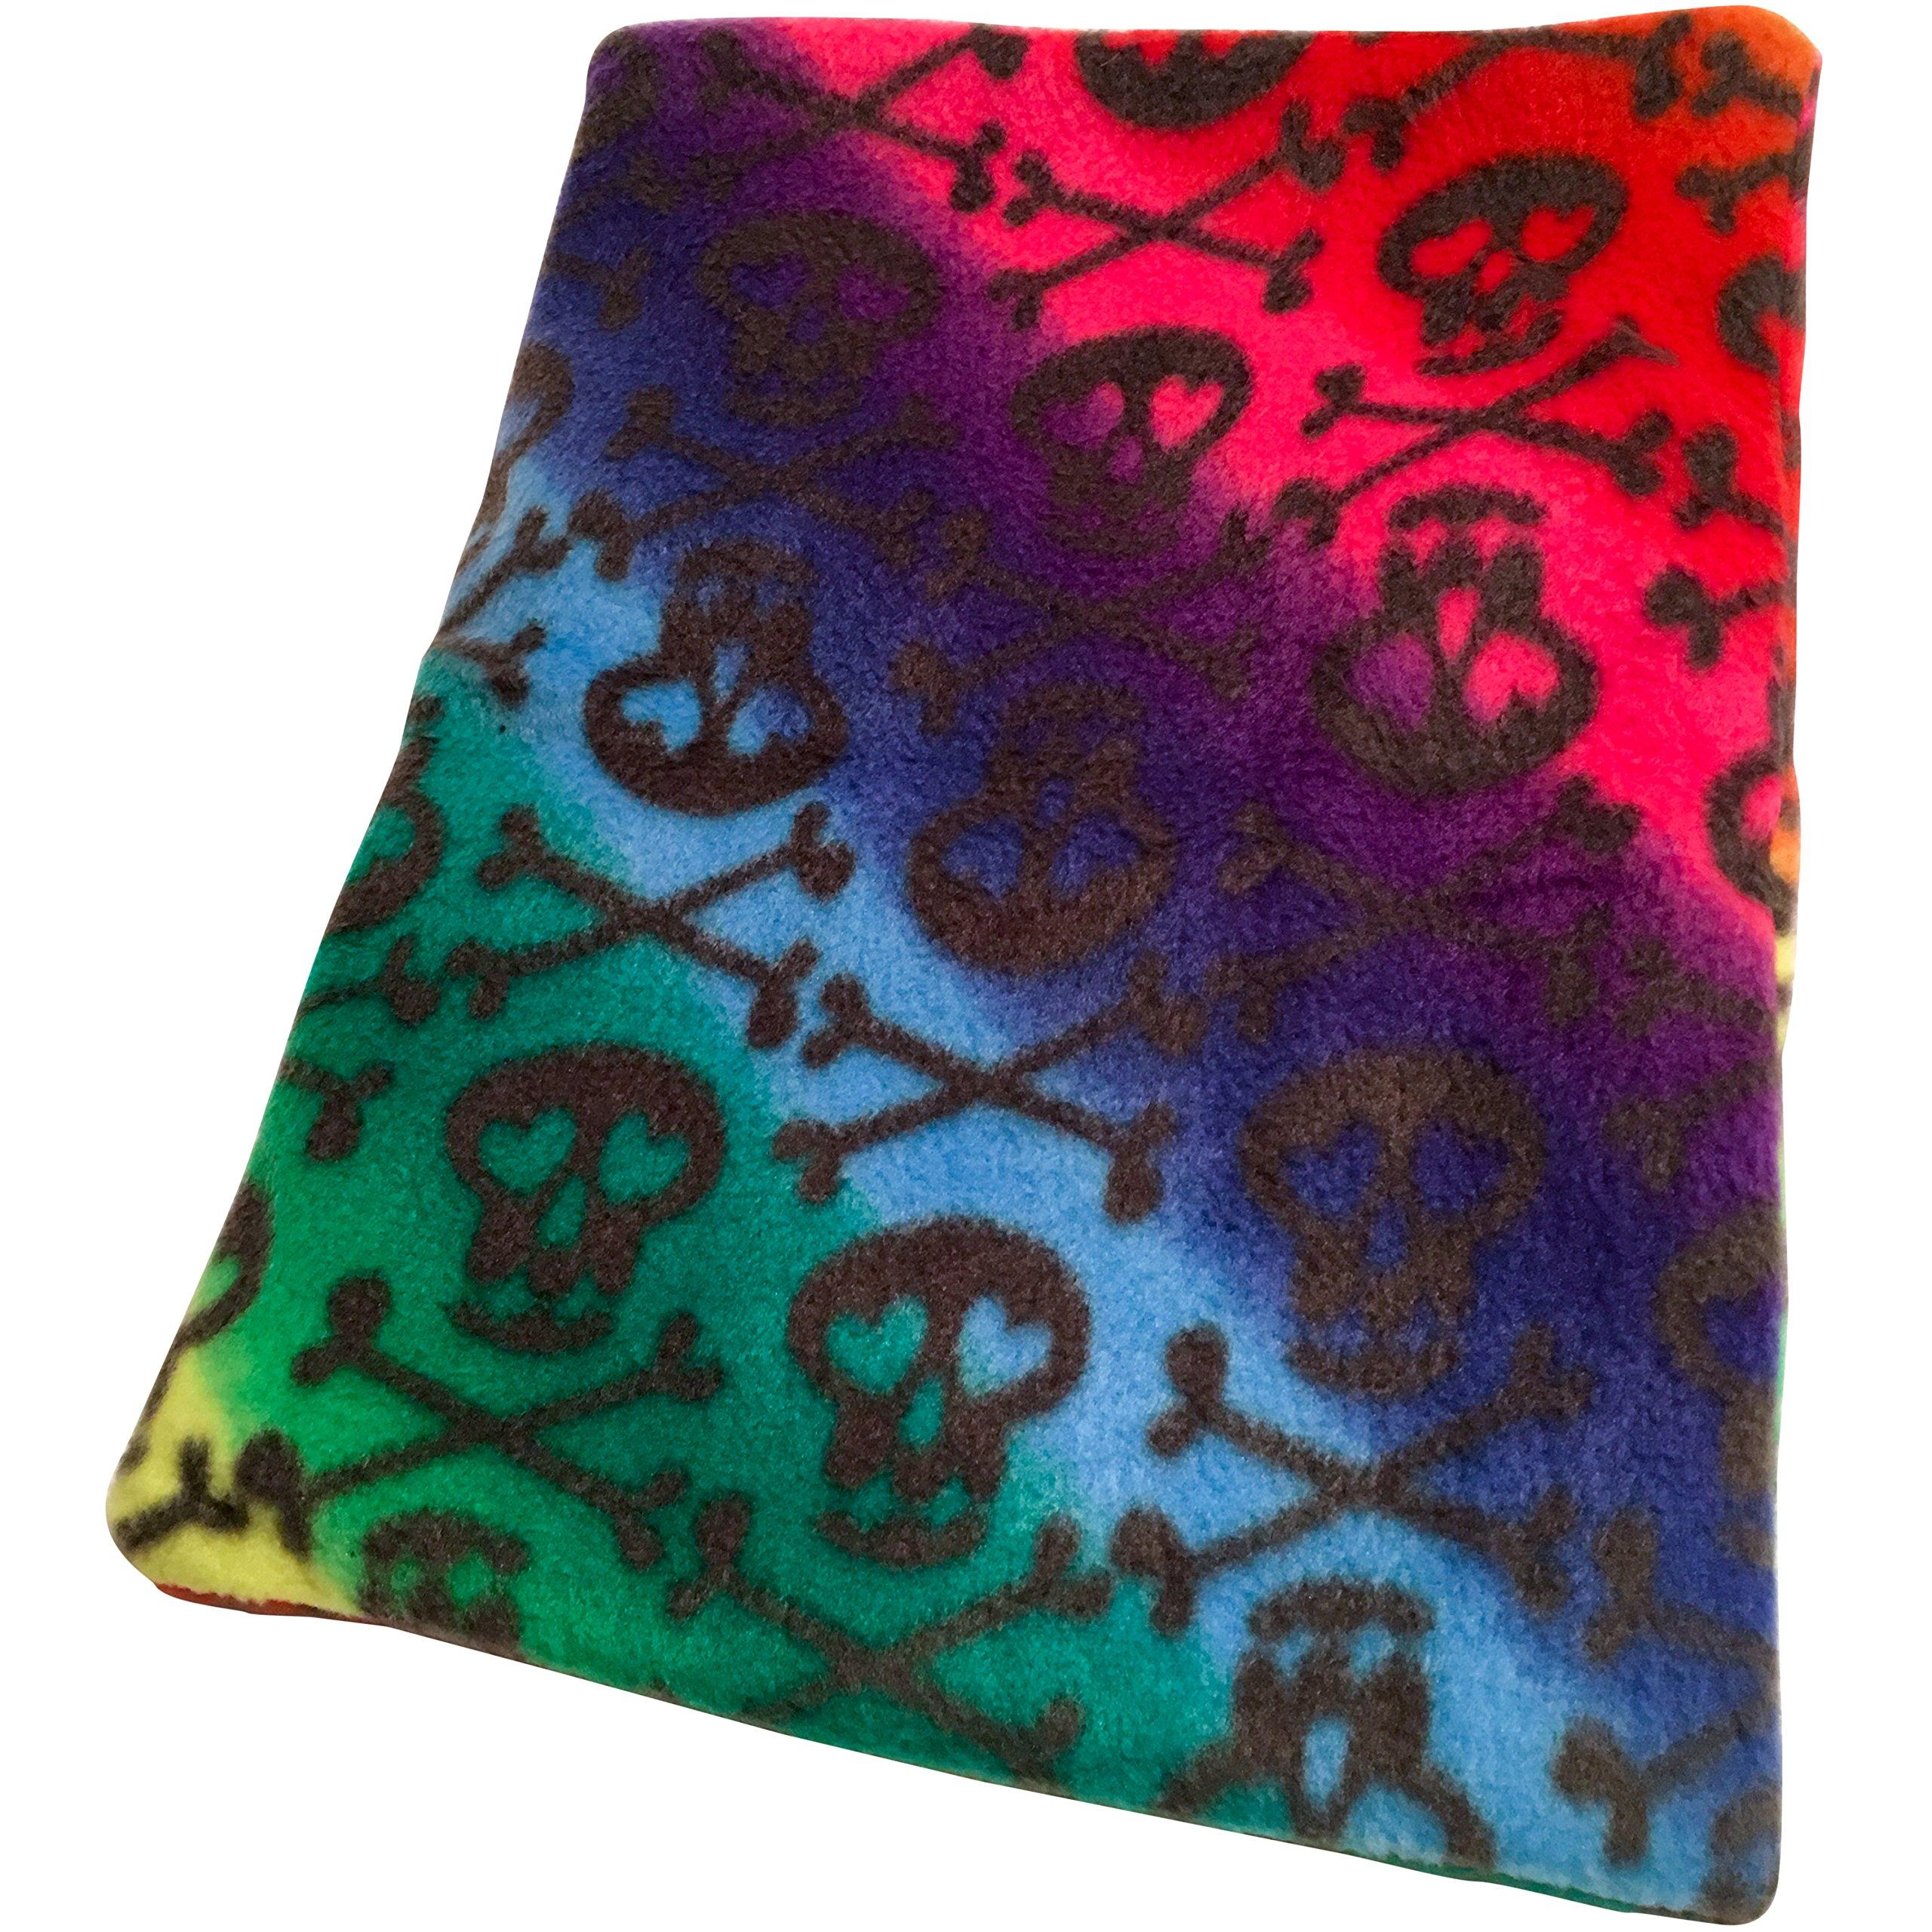 The Kozy Kritter Rainbow Color Skulls and Bones Fleece Snuggle Sack